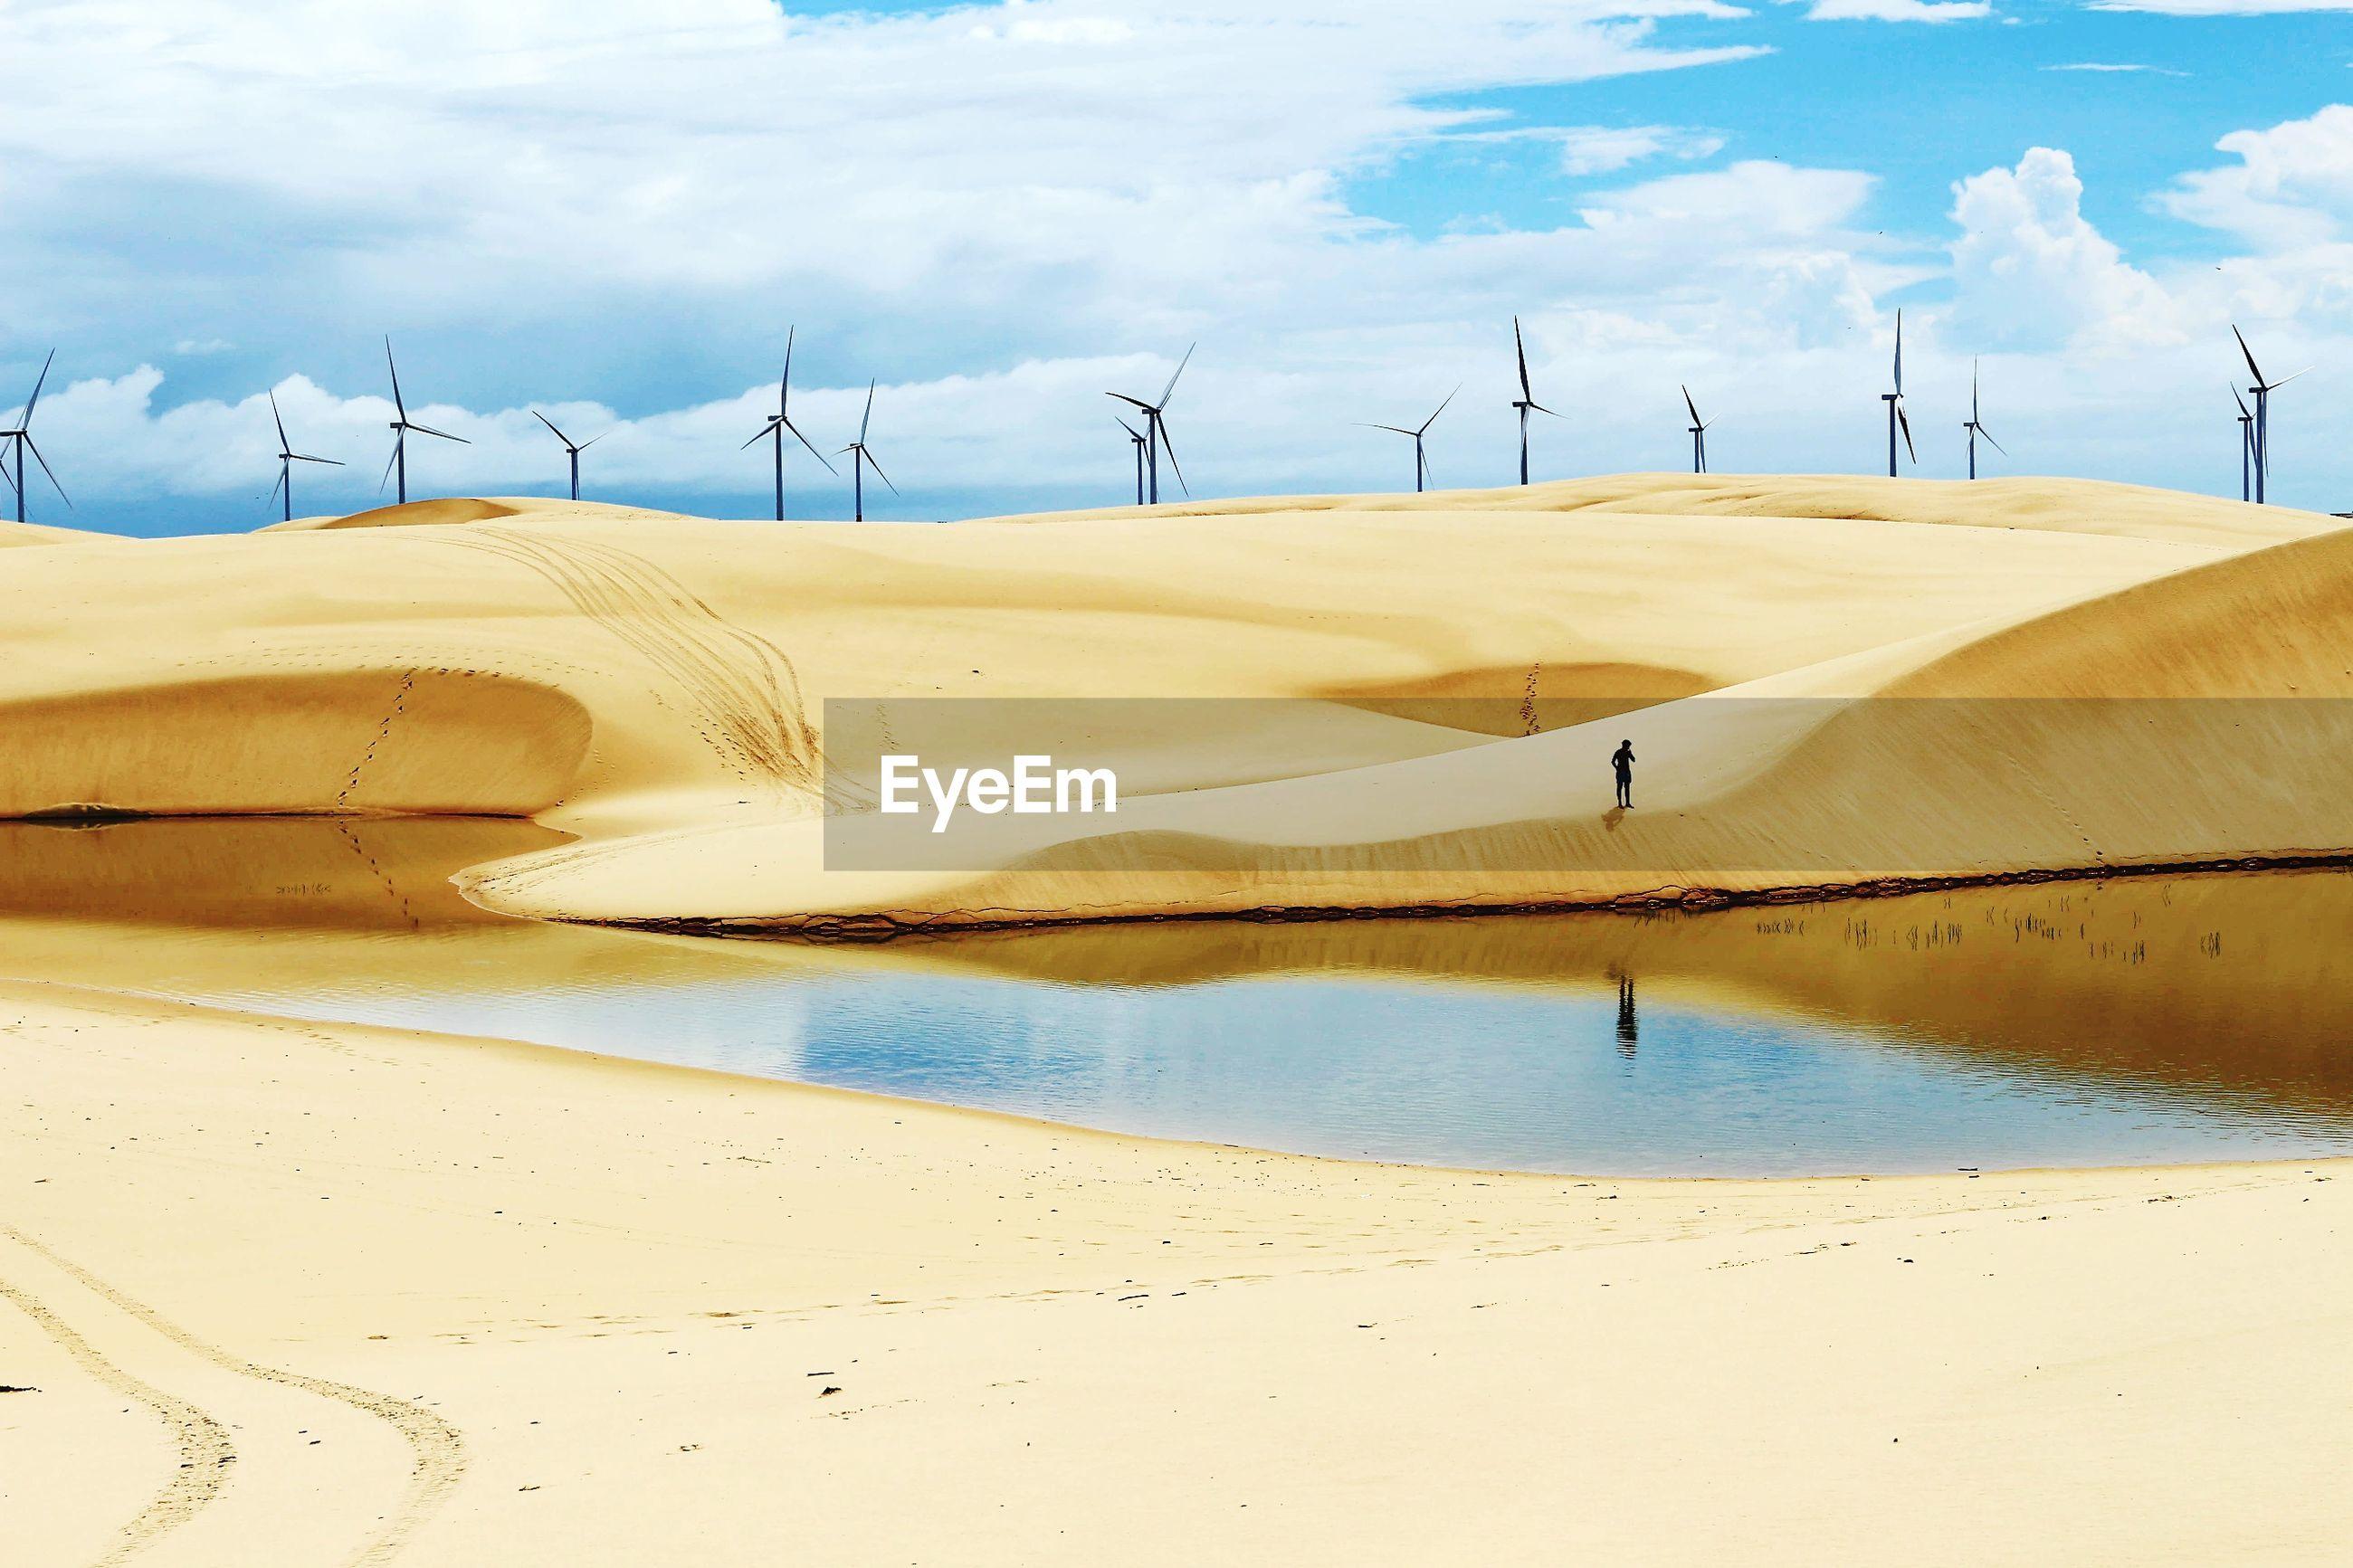 Windmills on sand at beach against cloudy sky